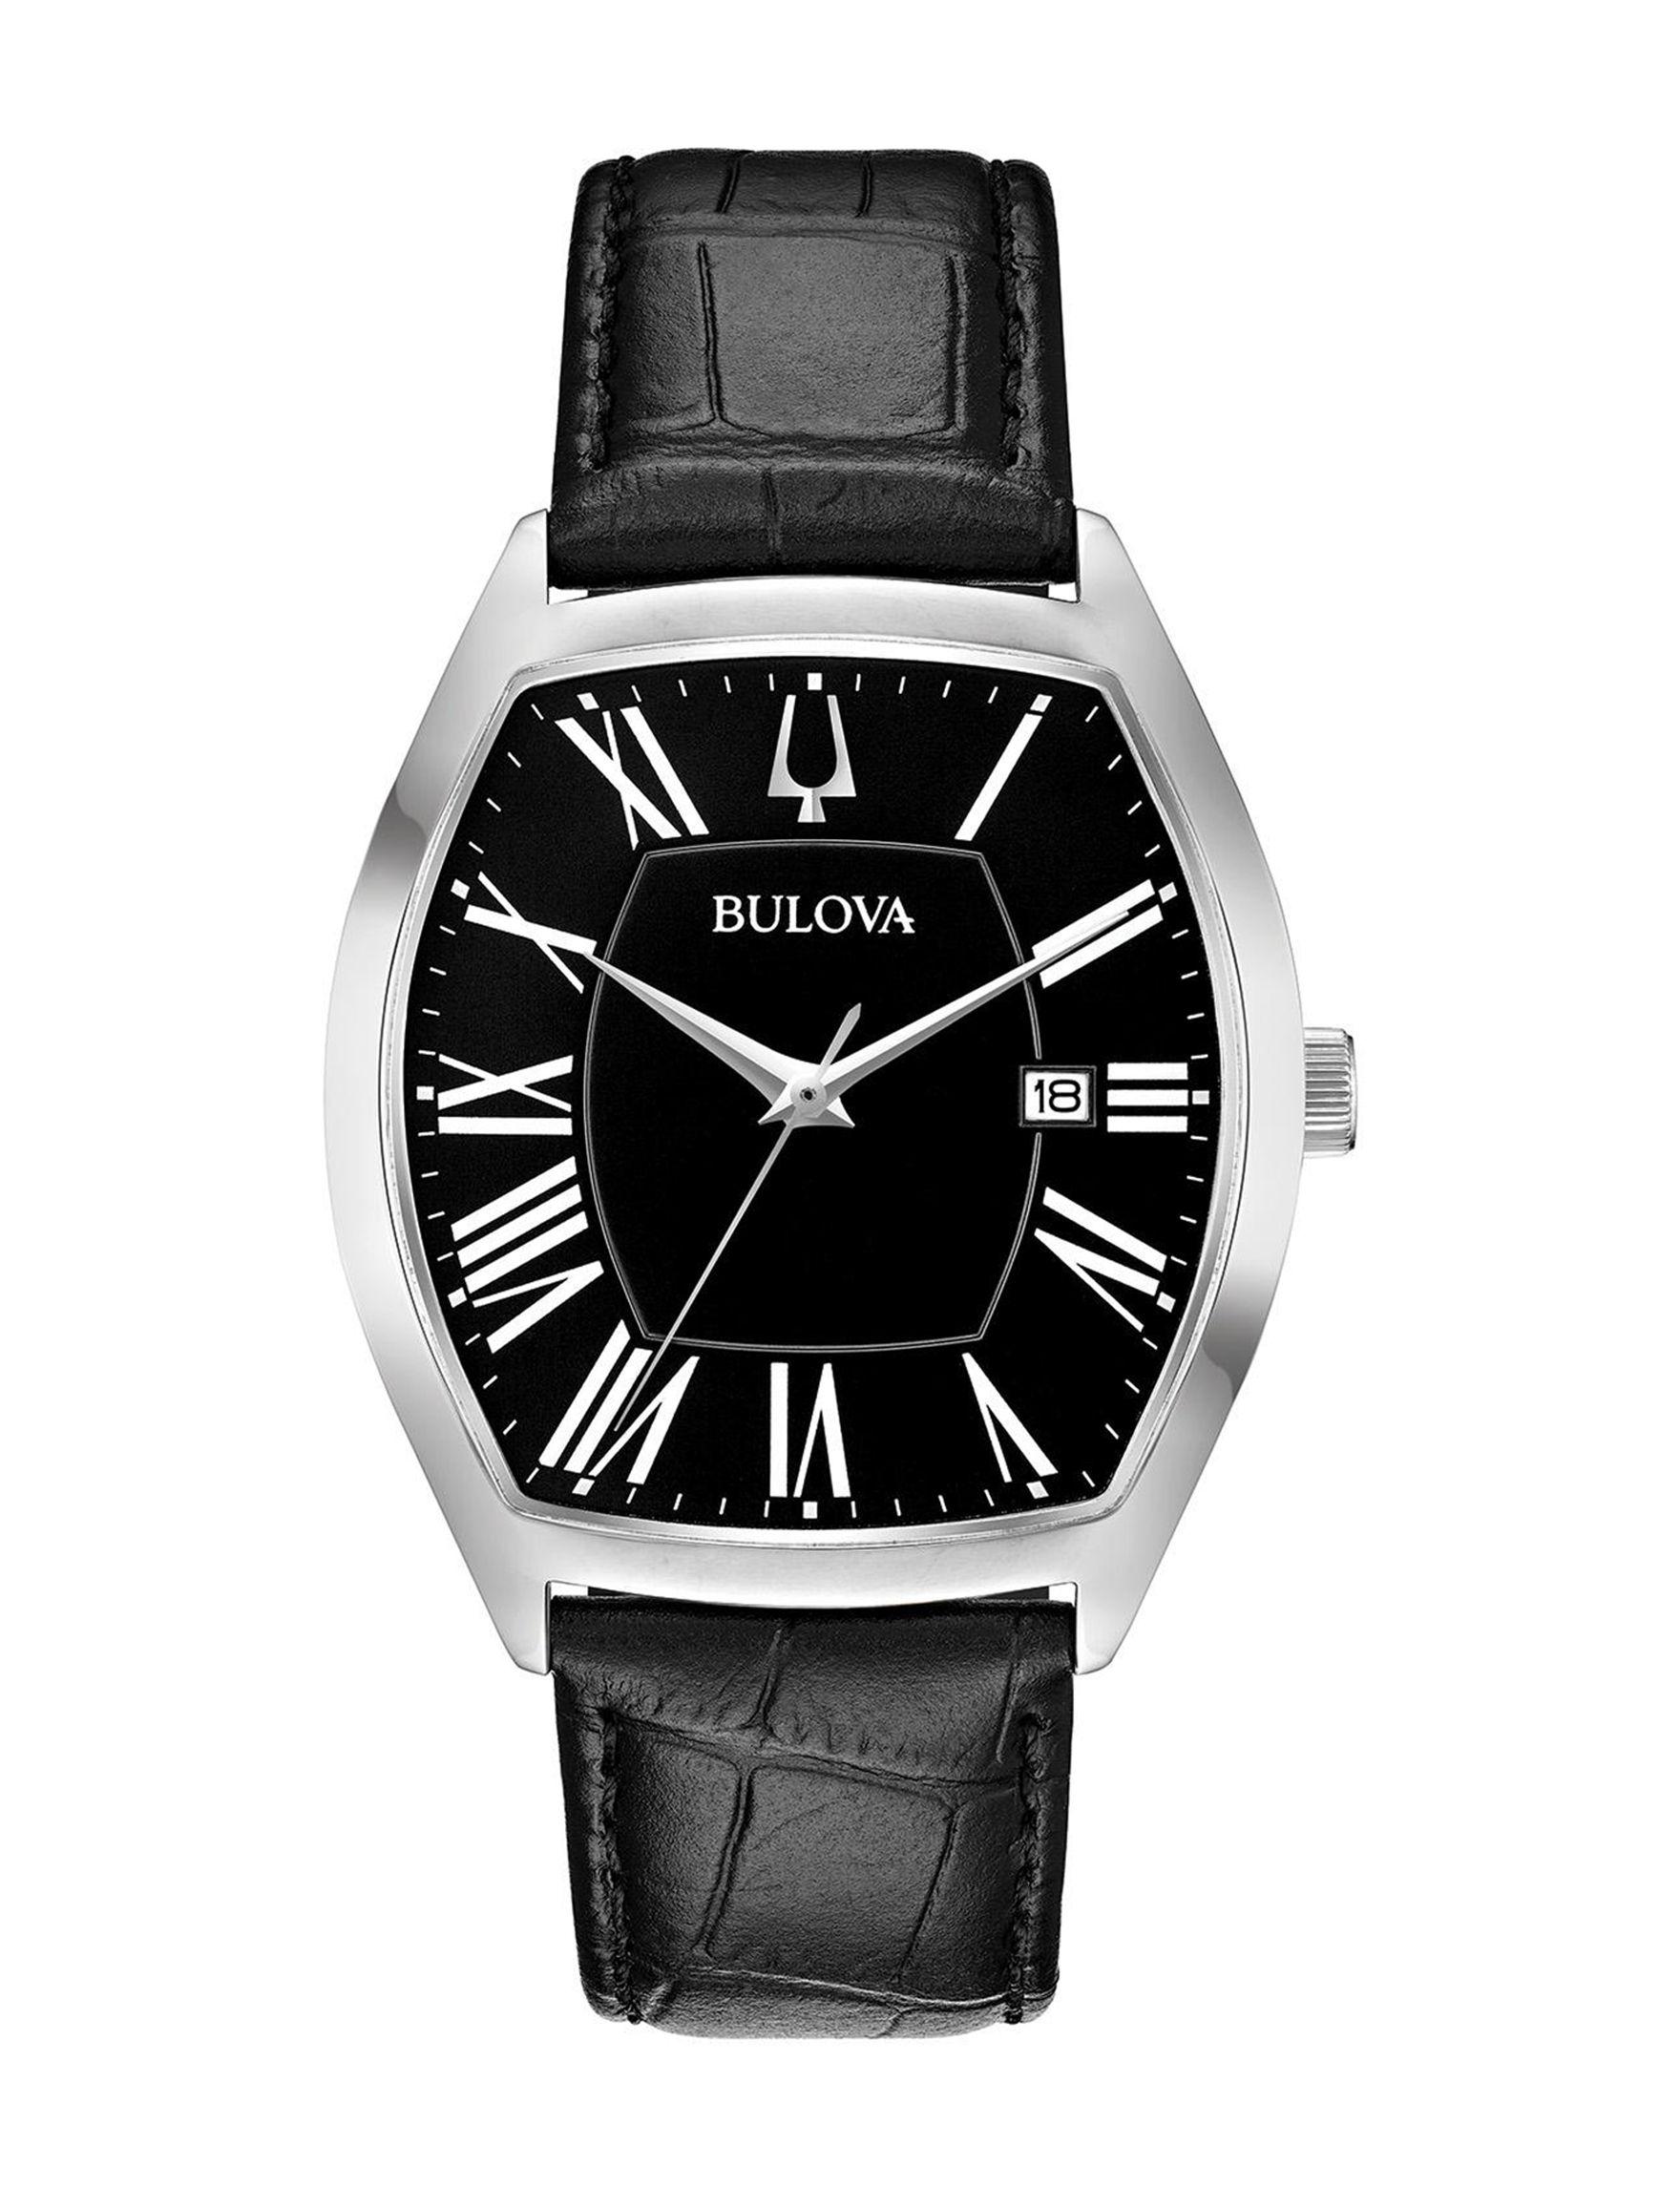 Bulova Black / Silver Fashion Watches